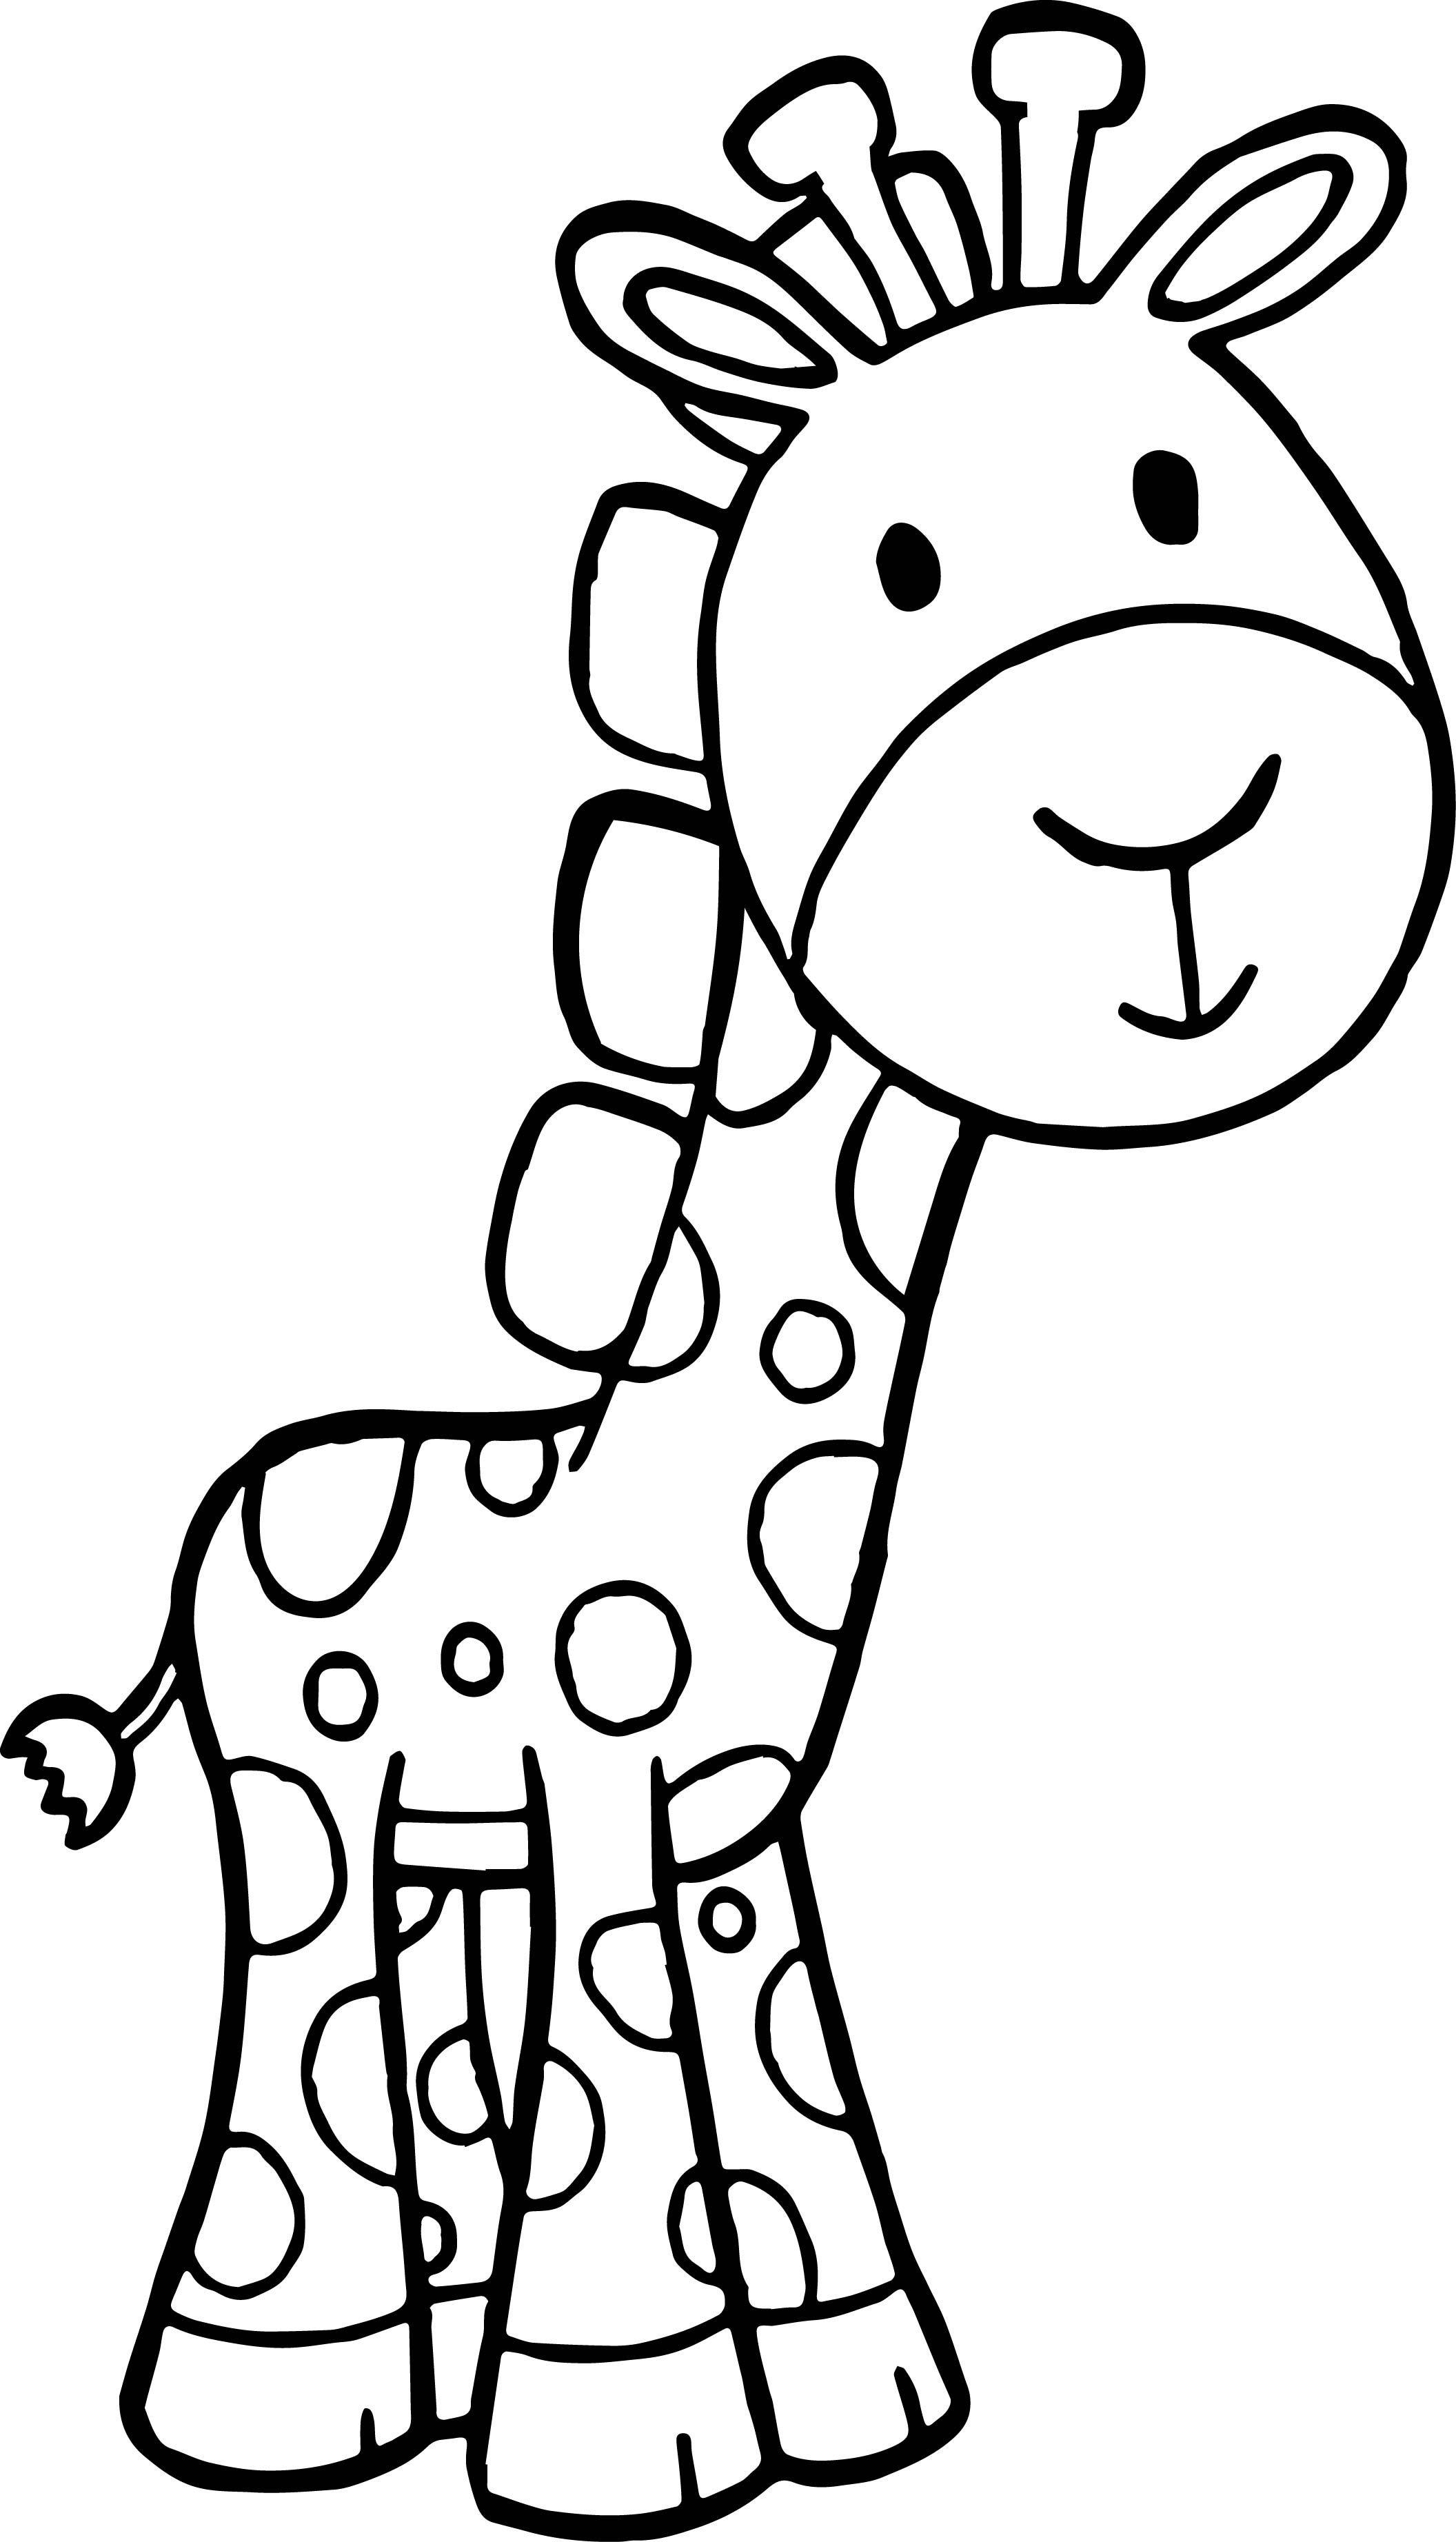 Nice Giraffe Cartoon Free Kids Beautiful Coloring Page Giraffe Coloring Pages Unicorn Coloring Pages Cute Coloring Pages